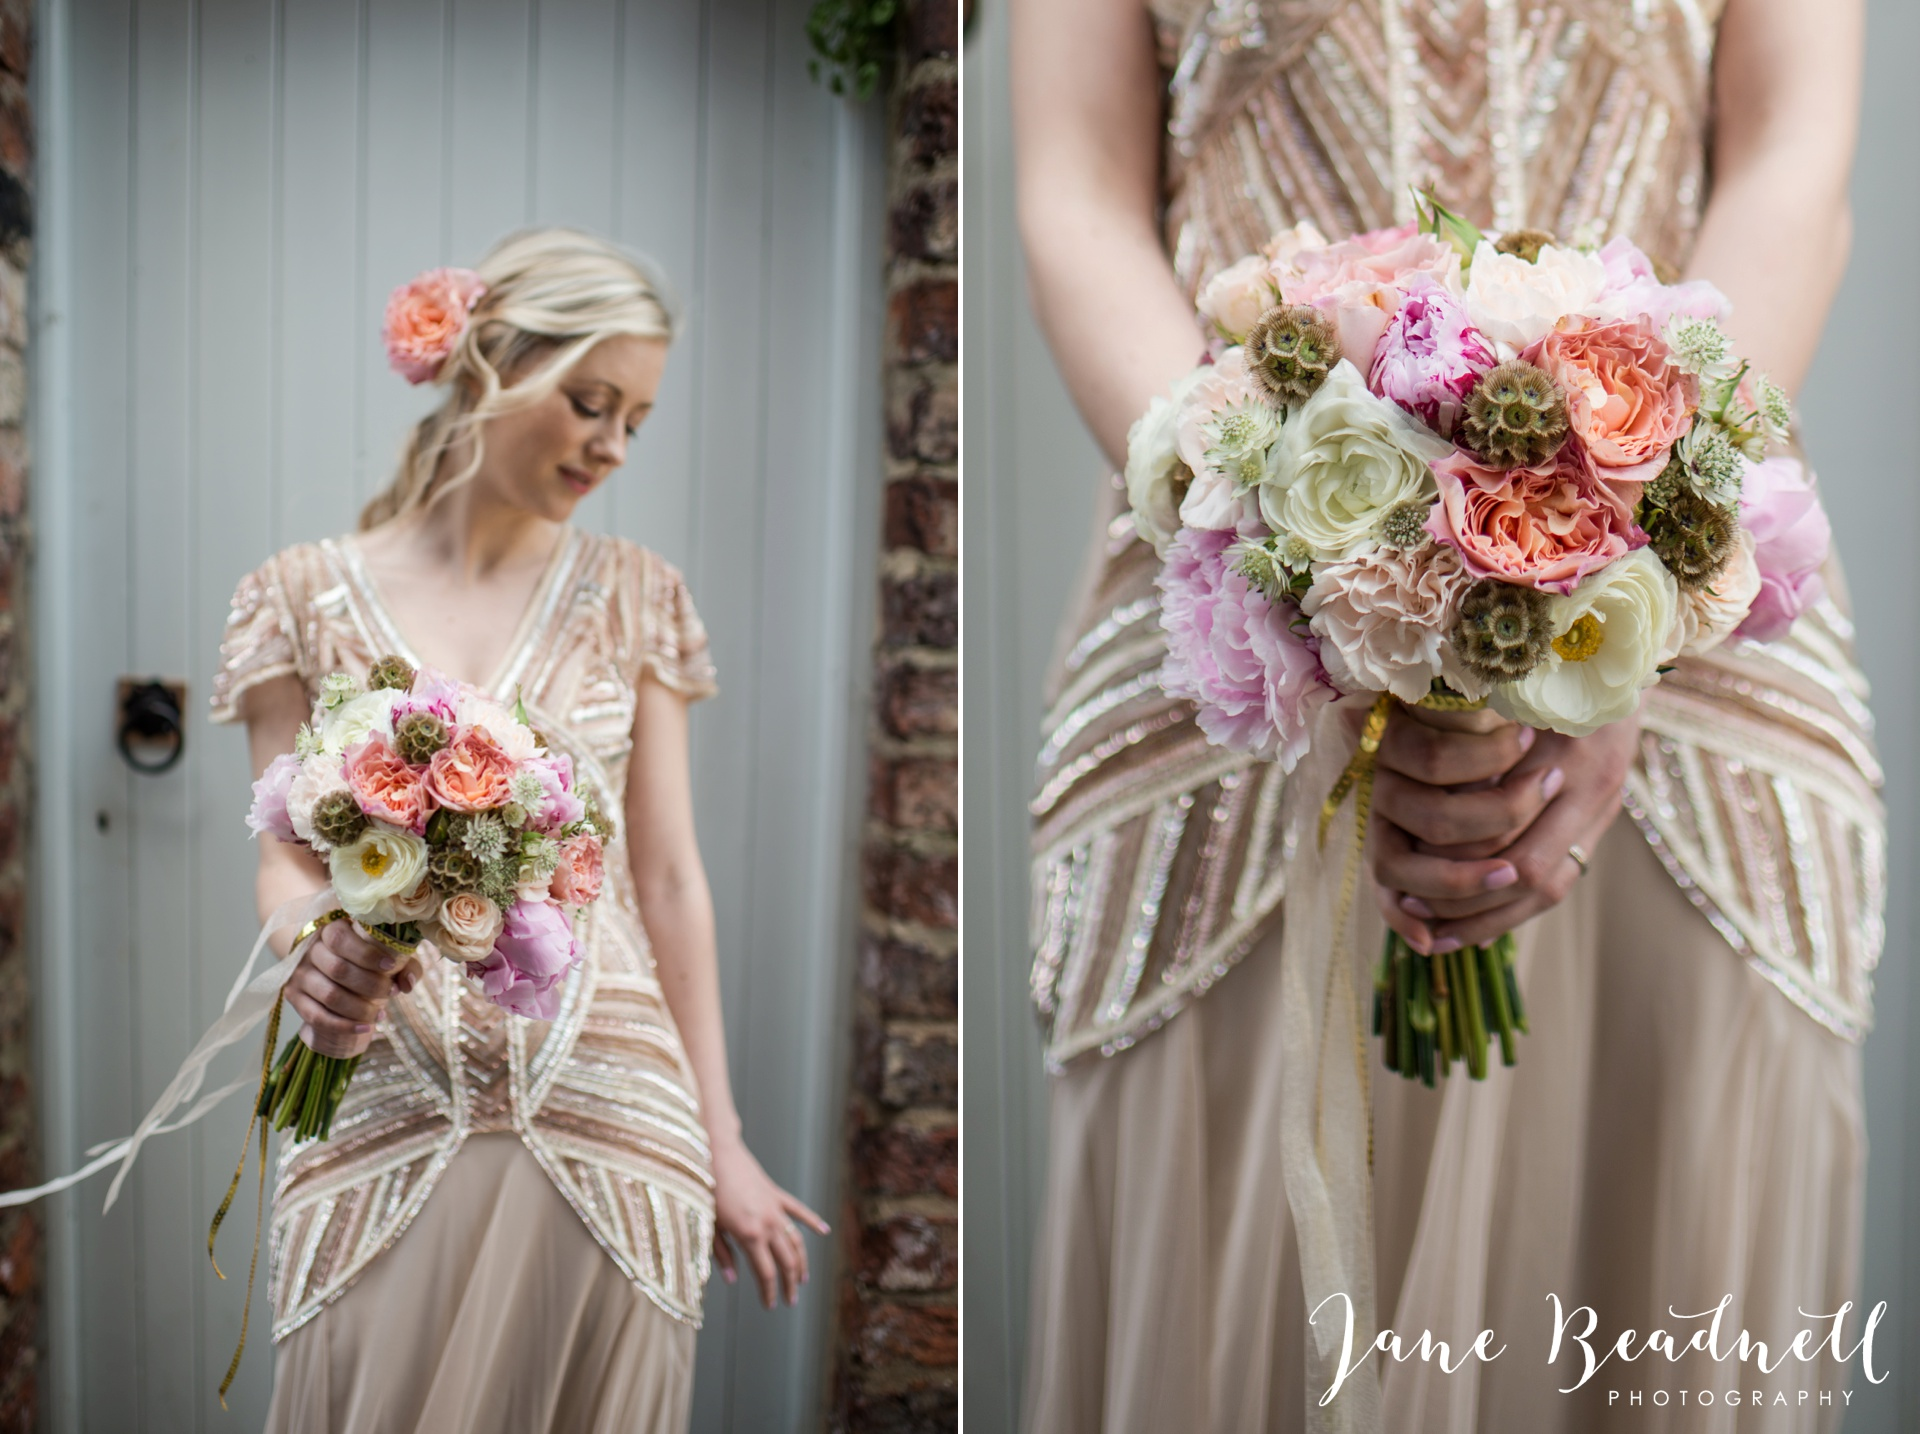 Jane Beadnell fine art wedding photographer York Bridal Photo Shoot_0001